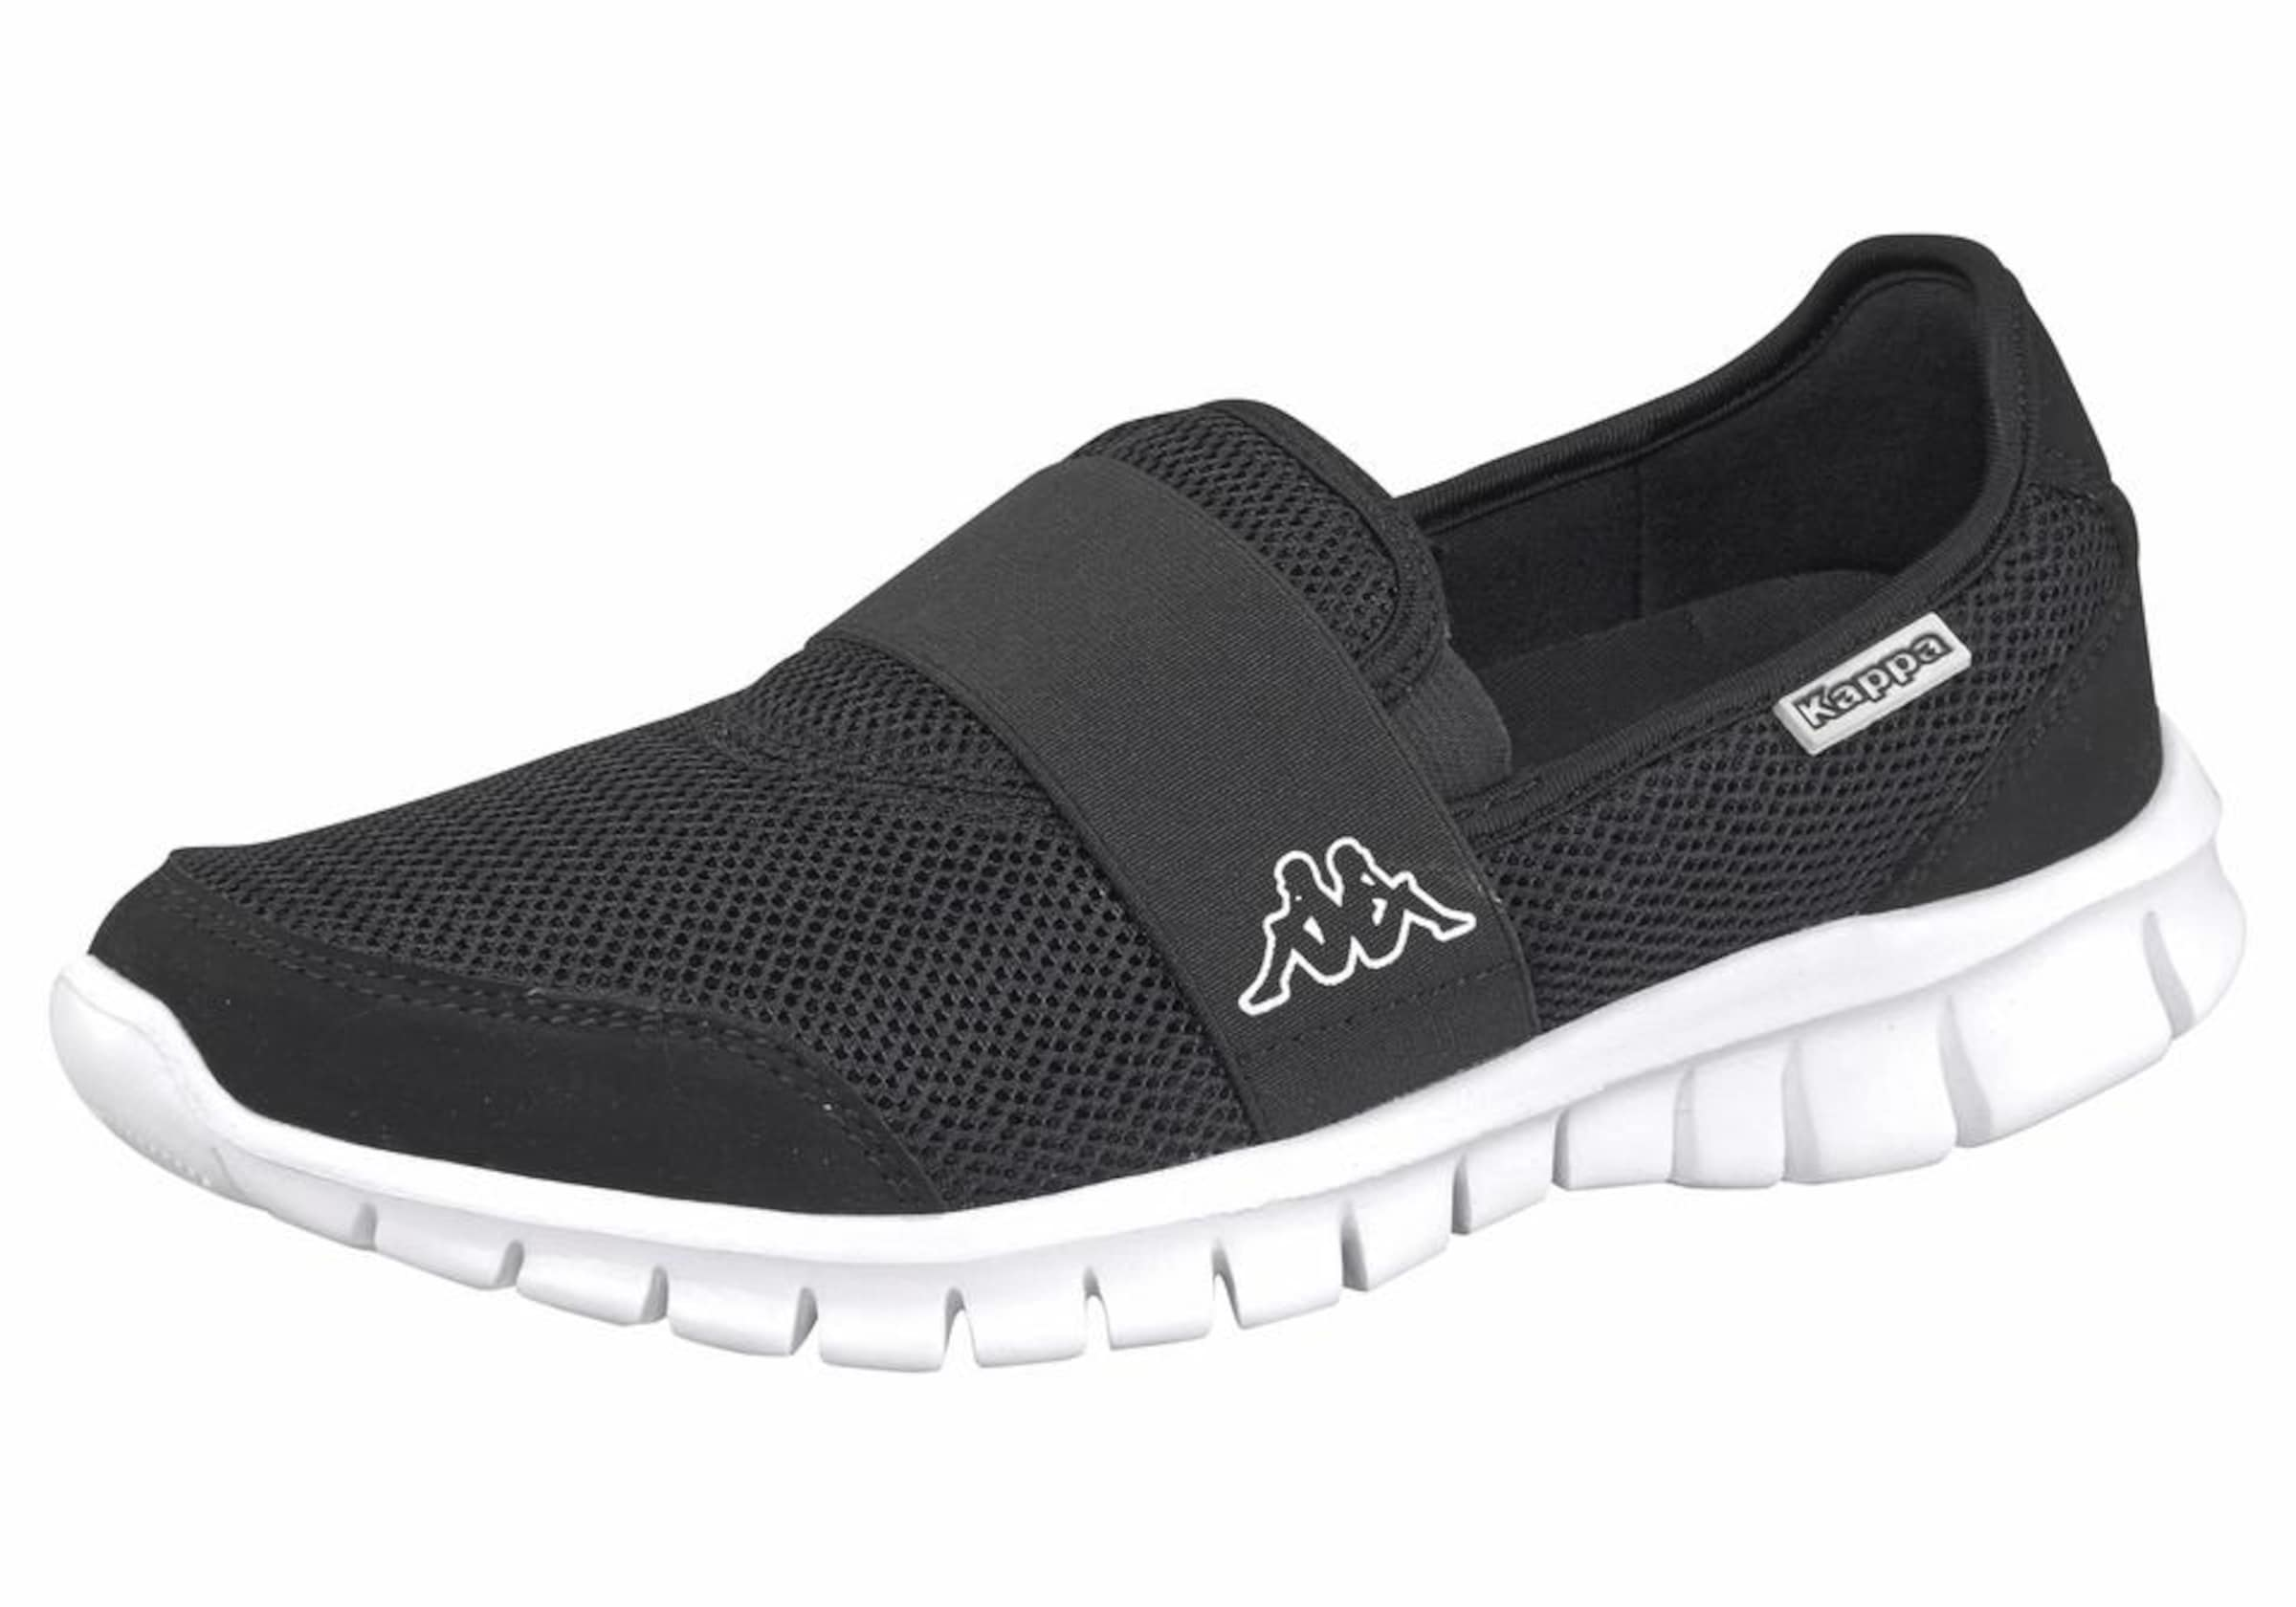 KAPPA Sneaker »Taro« Verschleißfeste billige Schuhe